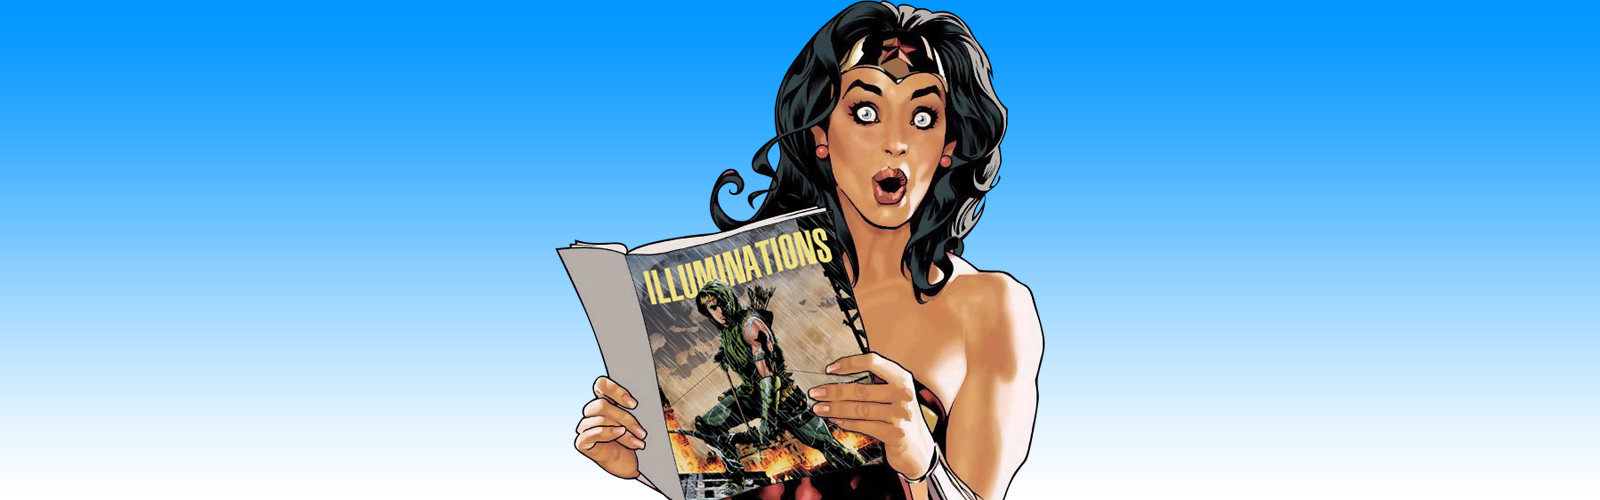 Illuminations - ACE Comics Webzine